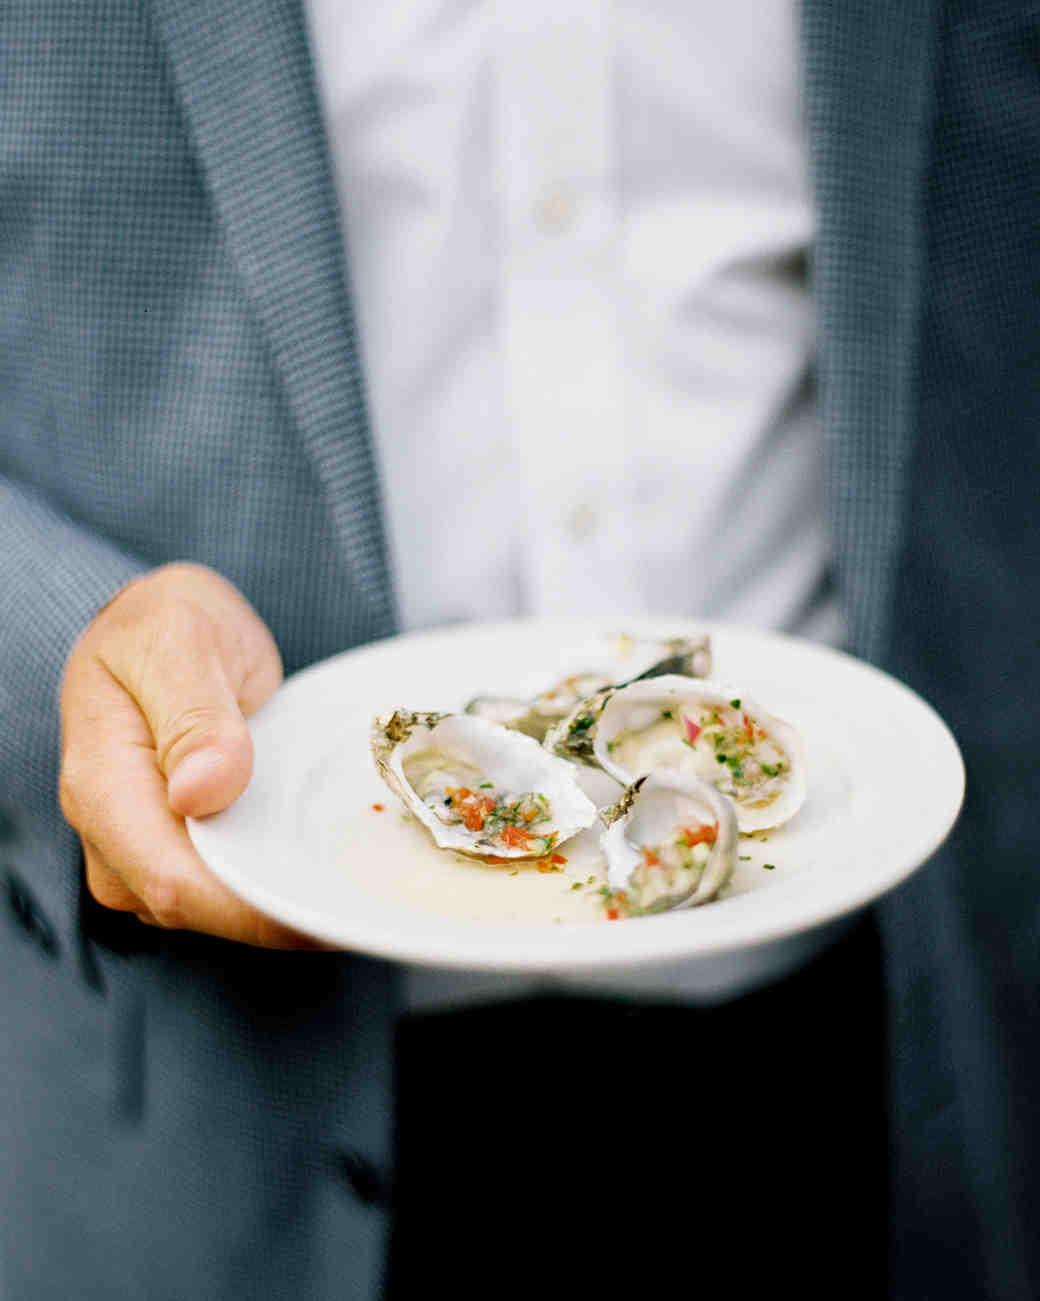 cassandra jason wedding oysters on plate